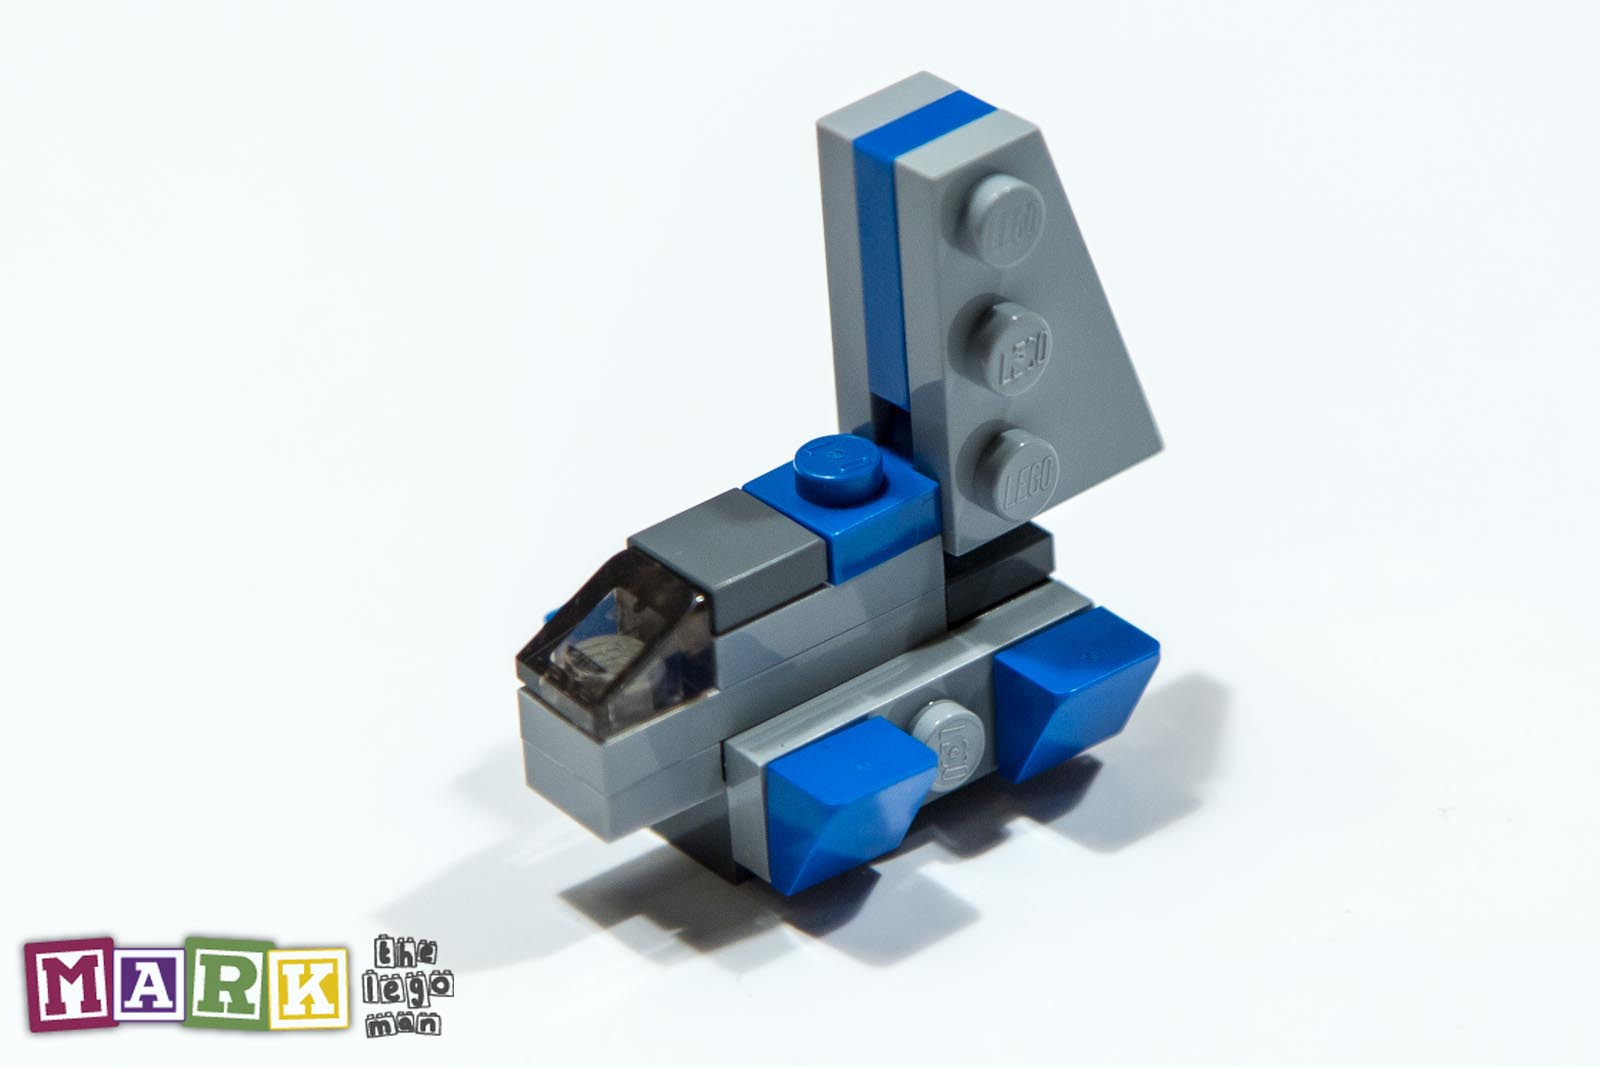 lego star wars micro